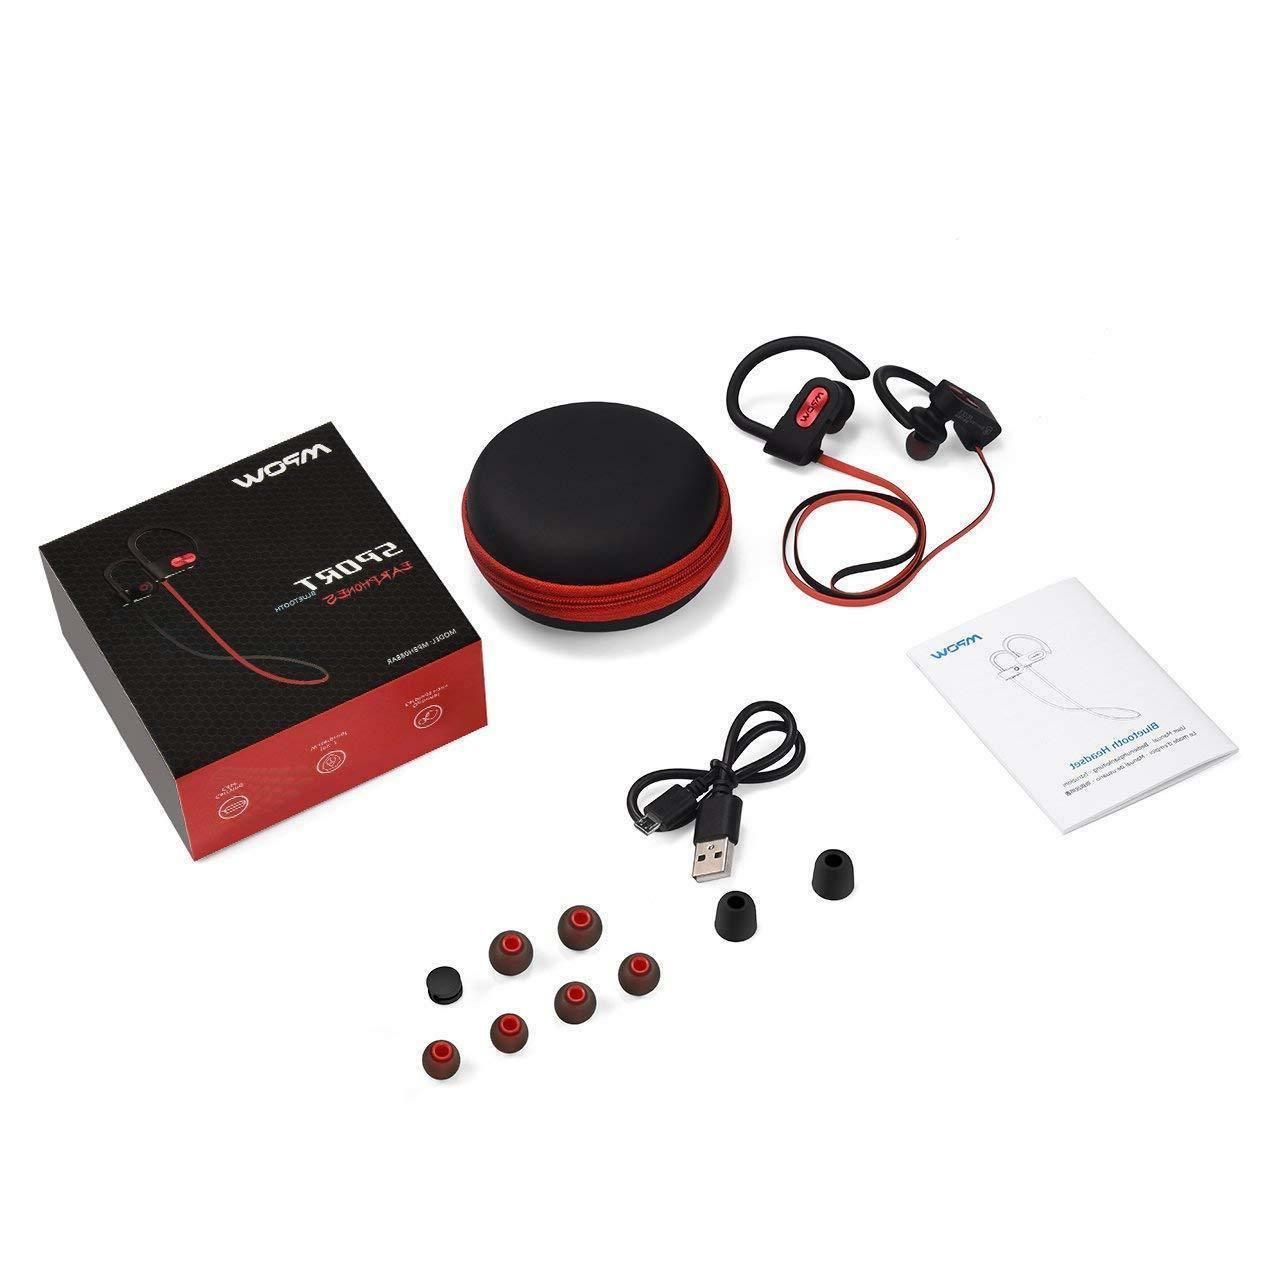 best loved ce61c f0136 Mpow Flame Waterproof Bluetooth Headphones IPX7, Wireless Earbuds